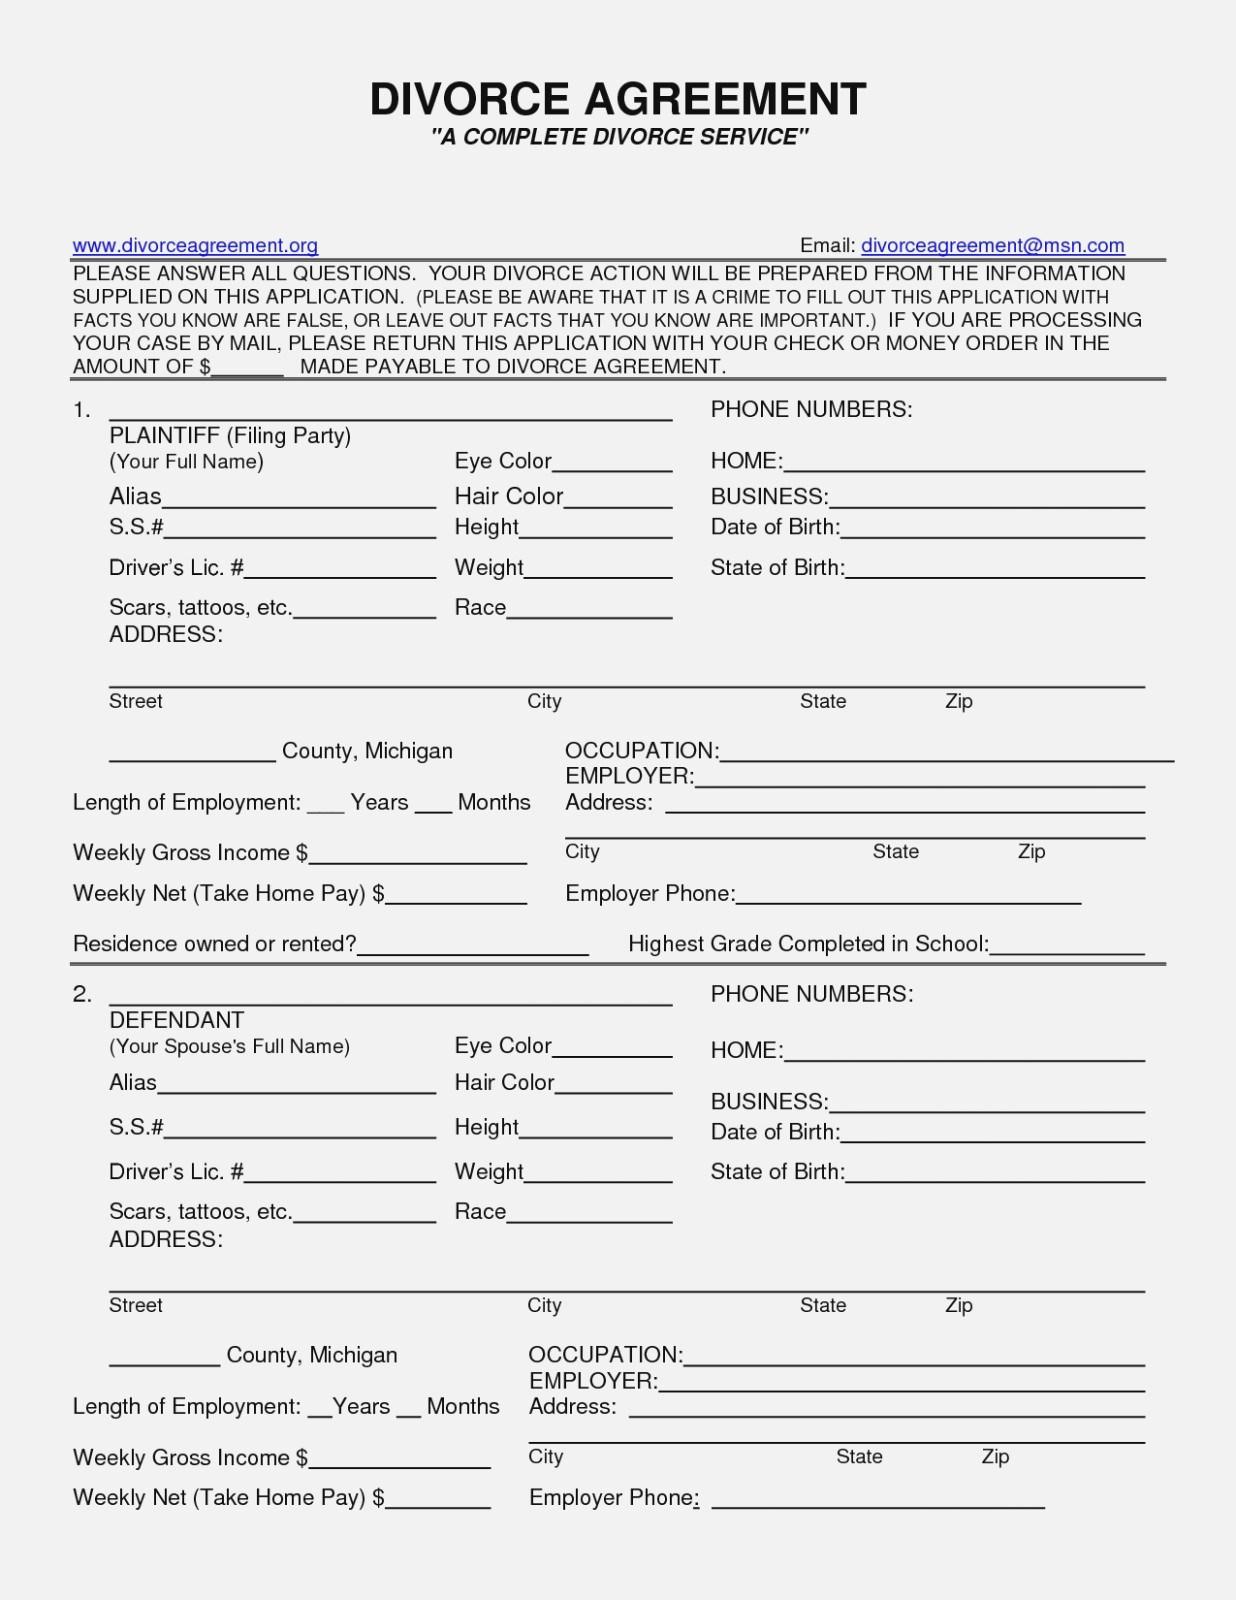 Divorce Application Form Pdf Nsw